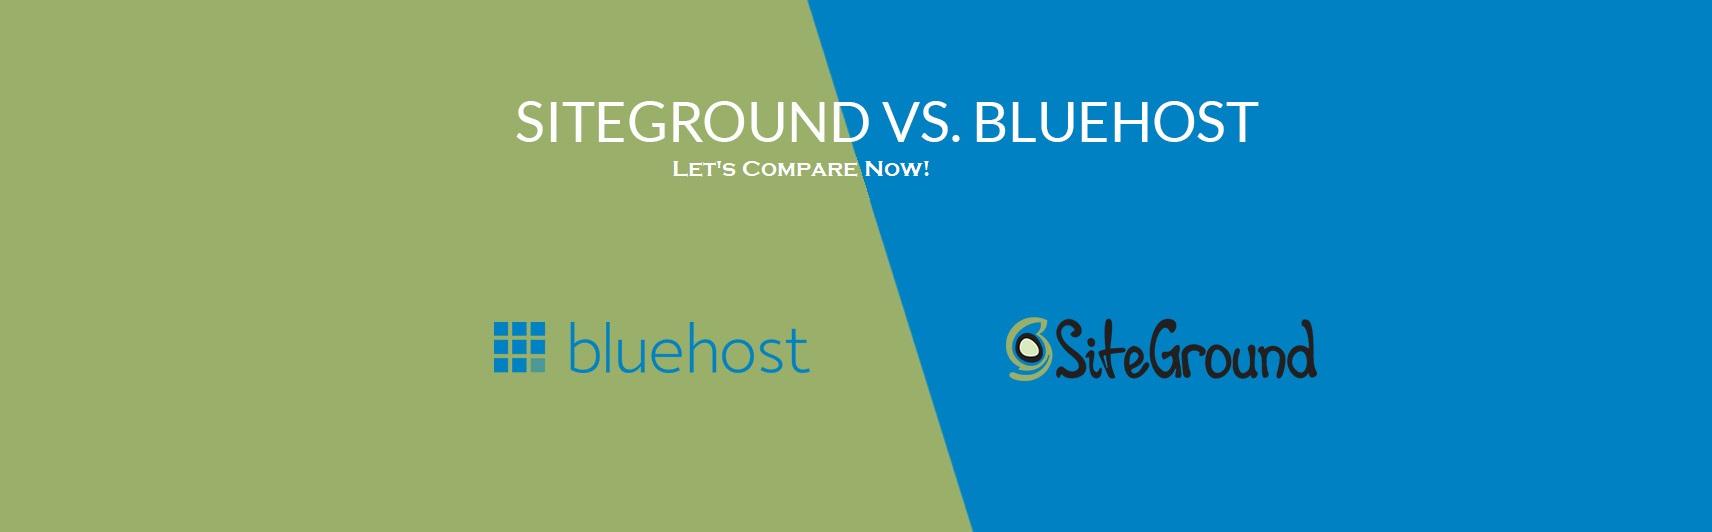 Bluehost vs Siteground 2019